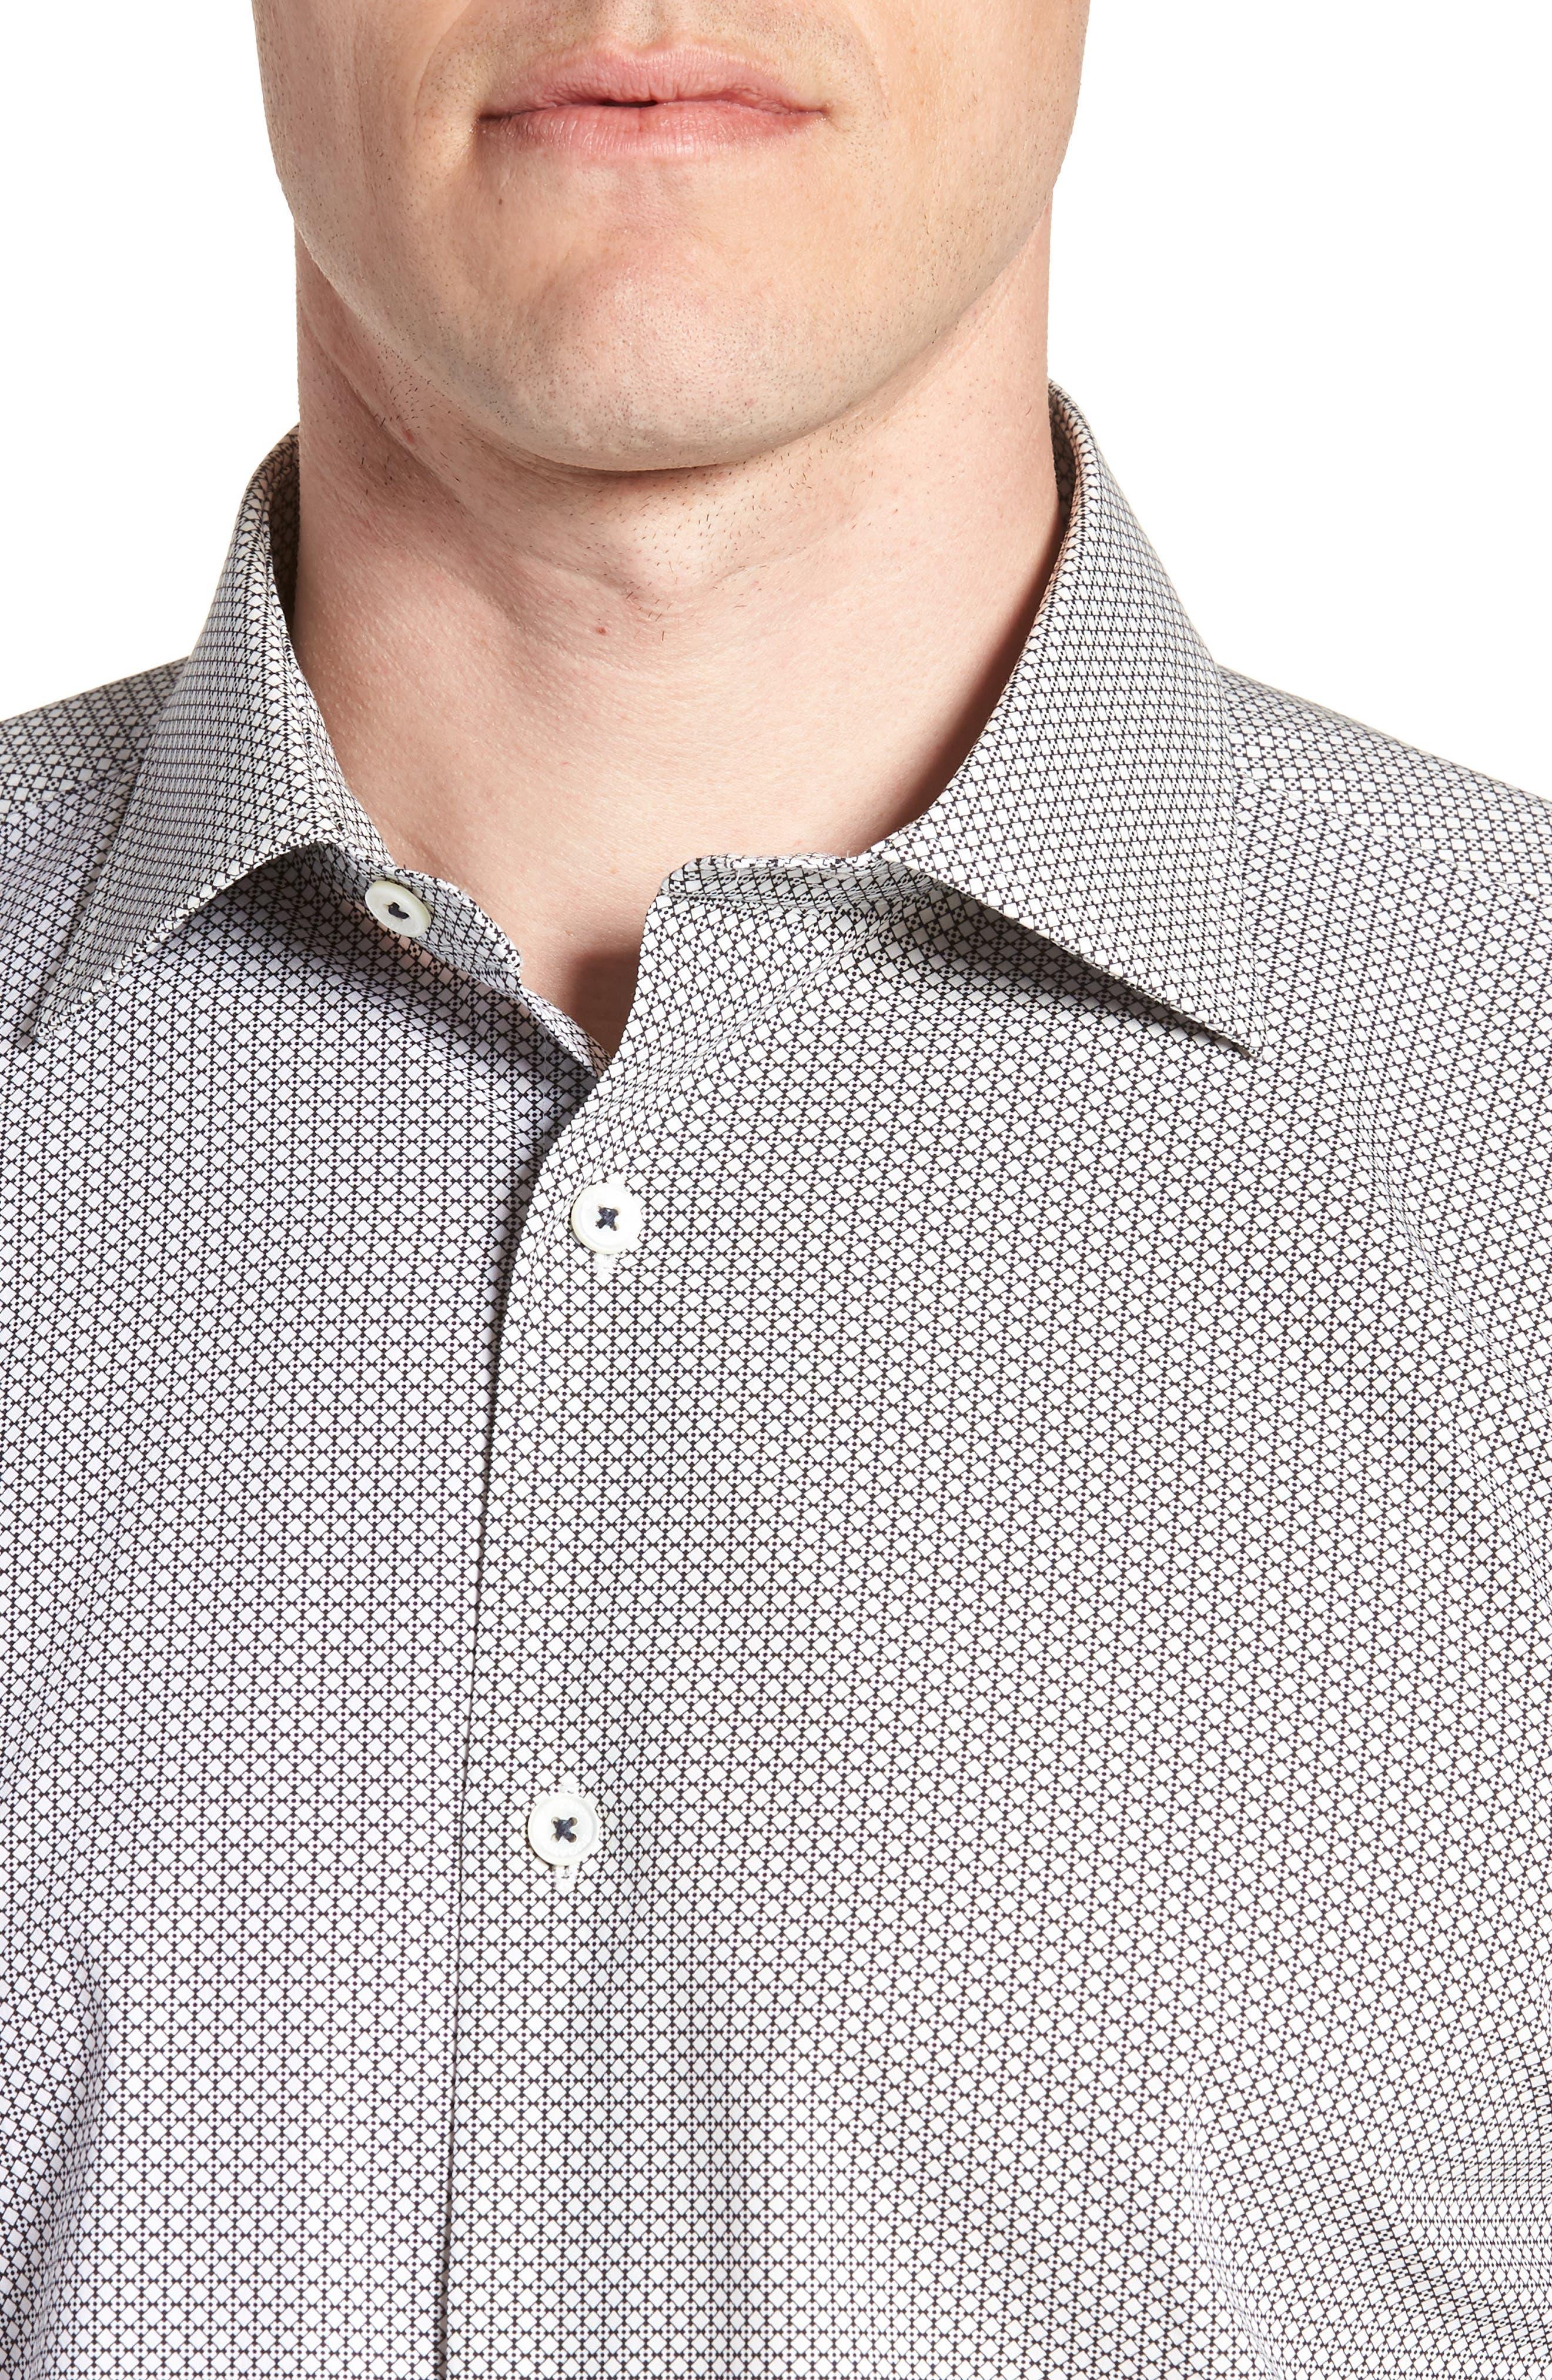 Trim Fit Print Dress Shirt,                             Alternate thumbnail 2, color,                             Platinum